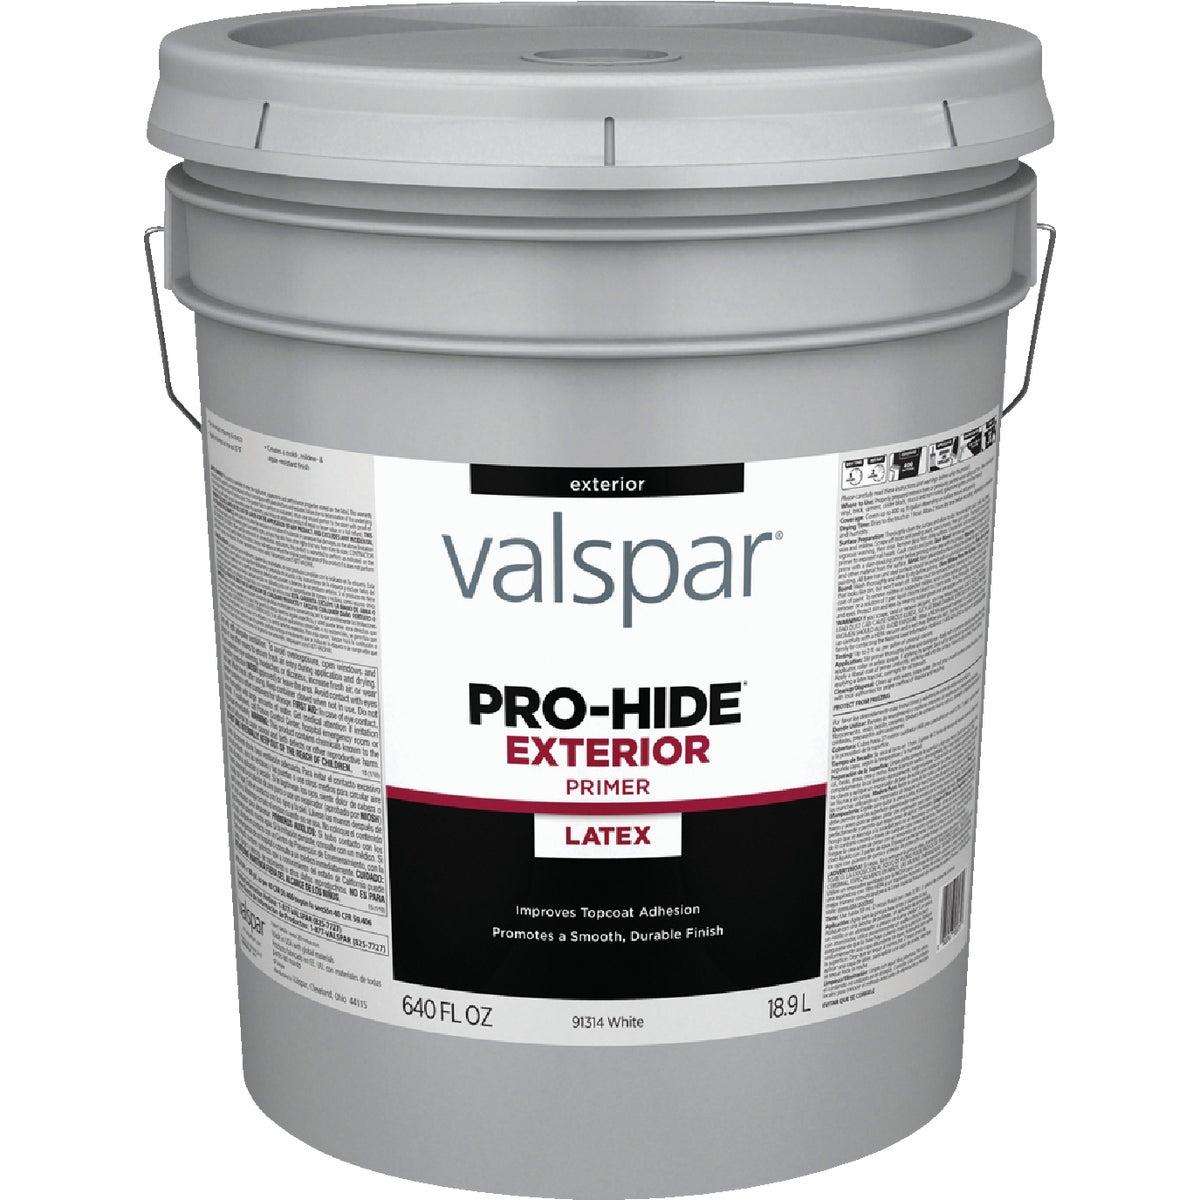 Valspar 11298 Professional Exterior Latex Primer, 5-Gallon